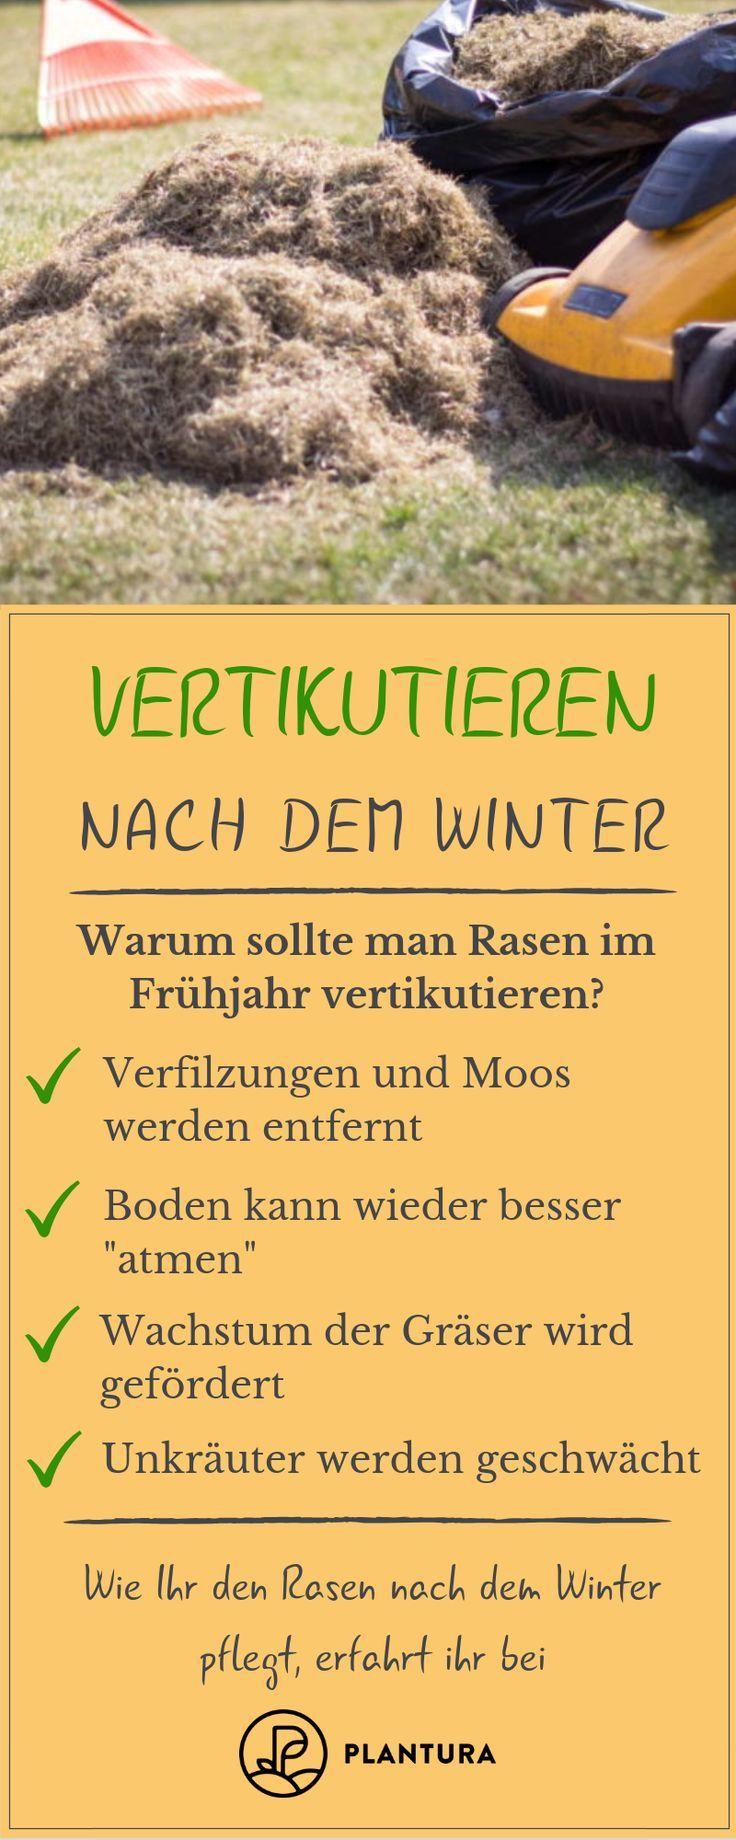 Vertikutieren nach dem Winter: Der nach dem Winter geschwächte Rasen wird vergrößert ...-#dem #der #geschwächte #nach #Rasen #vergrößert #vertikutieren #Winter #wird #gemüsegartenanlegen